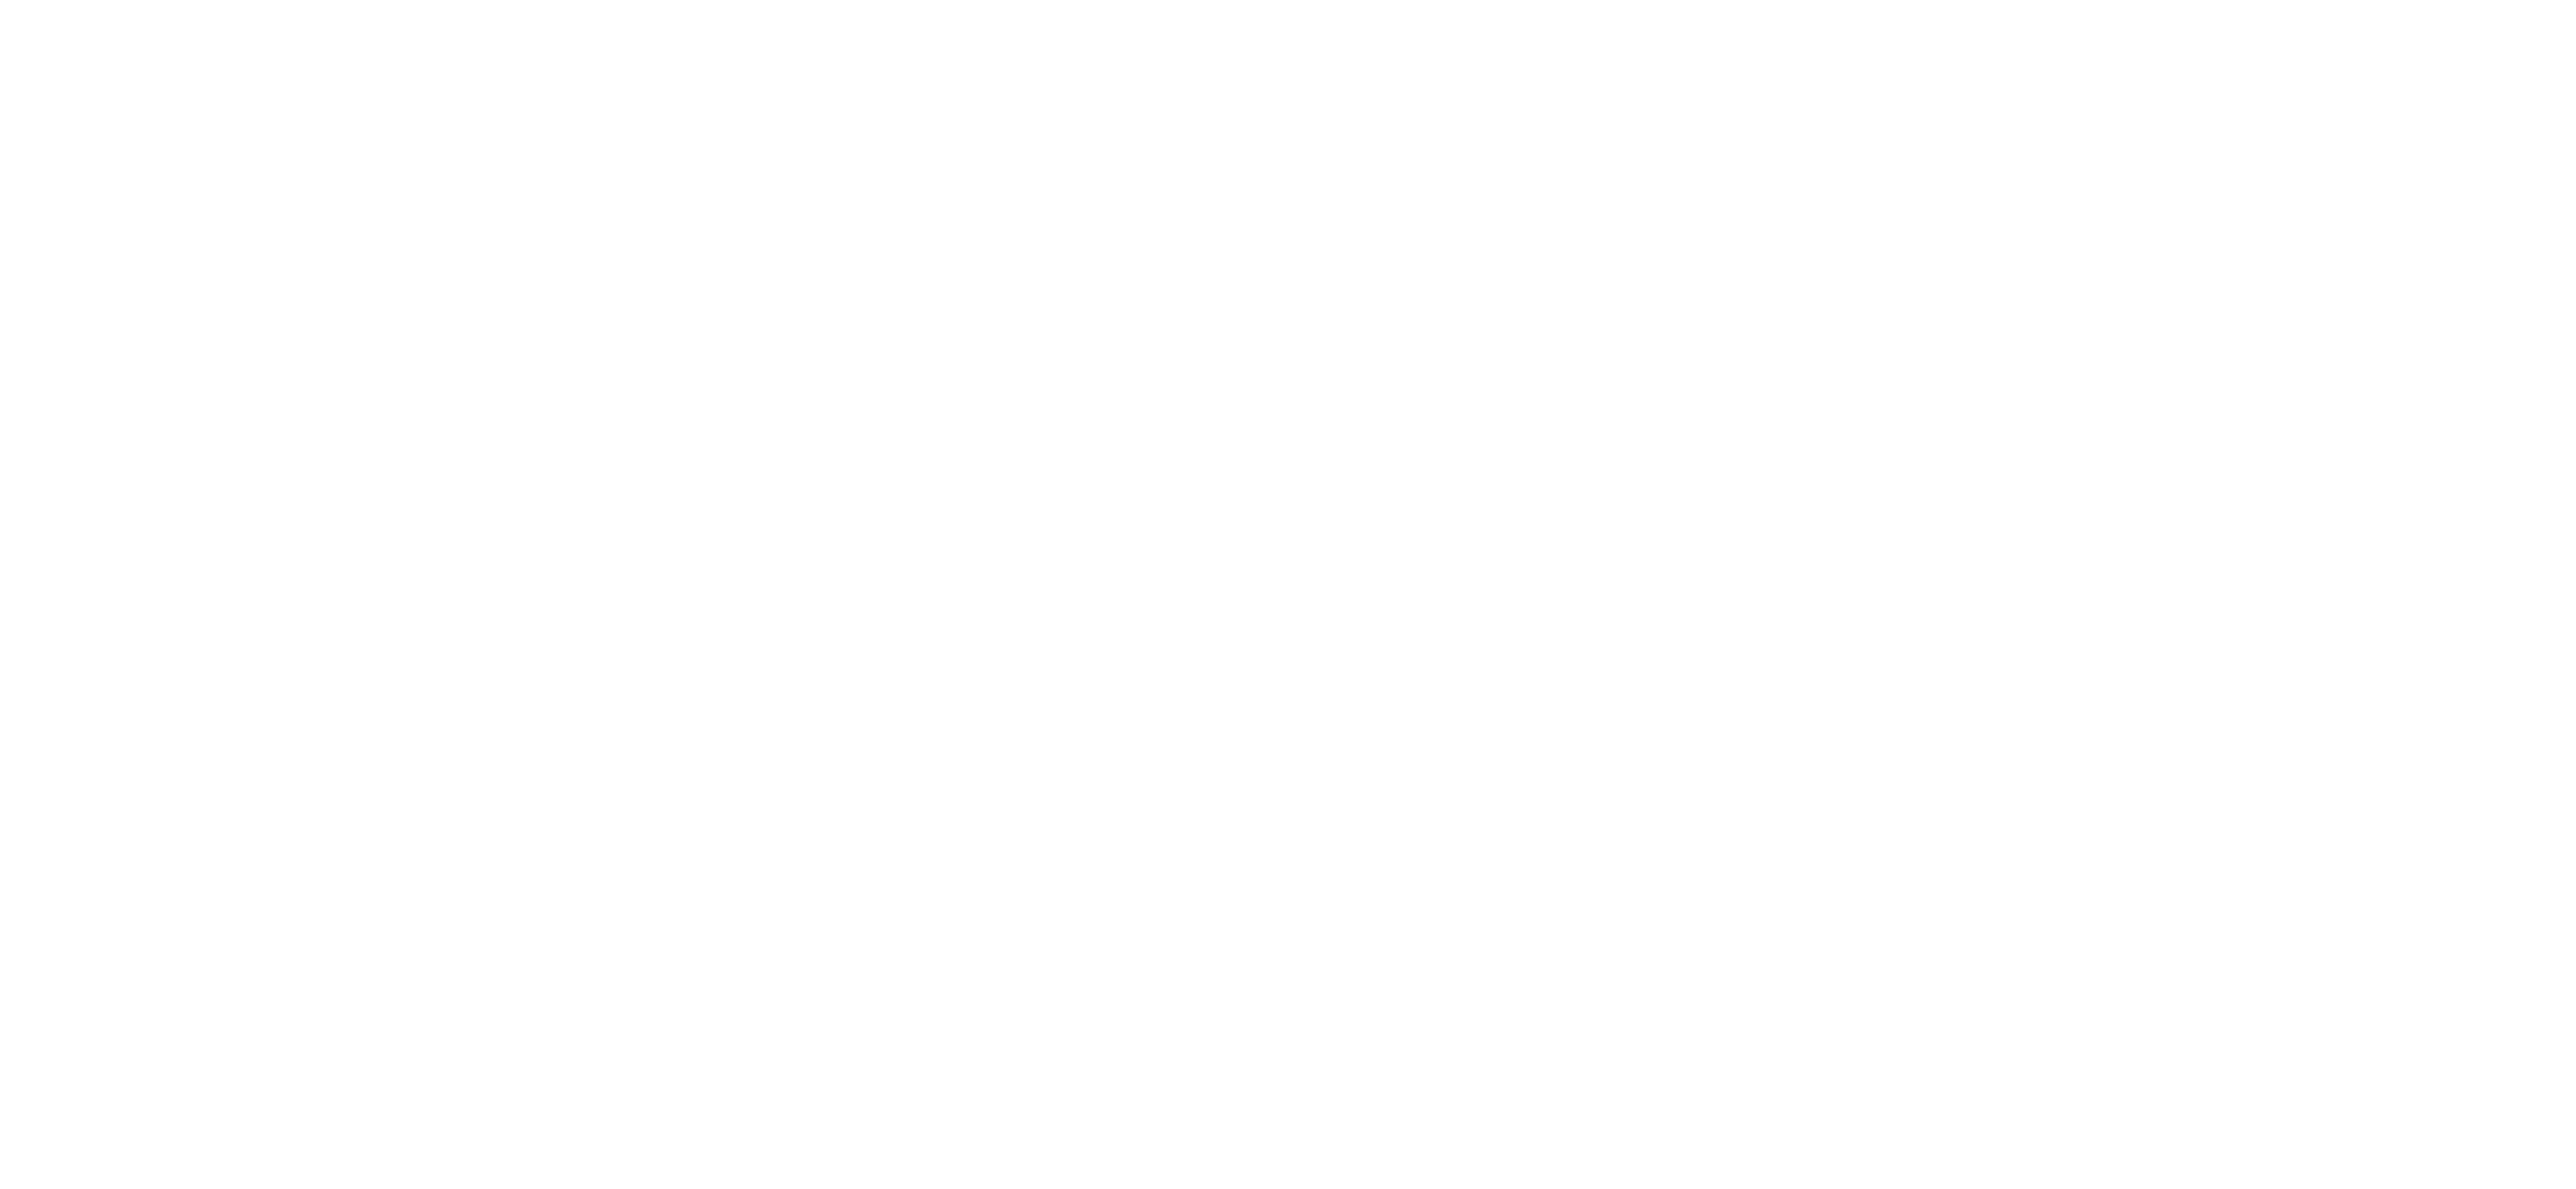 The Morgan | Web Design